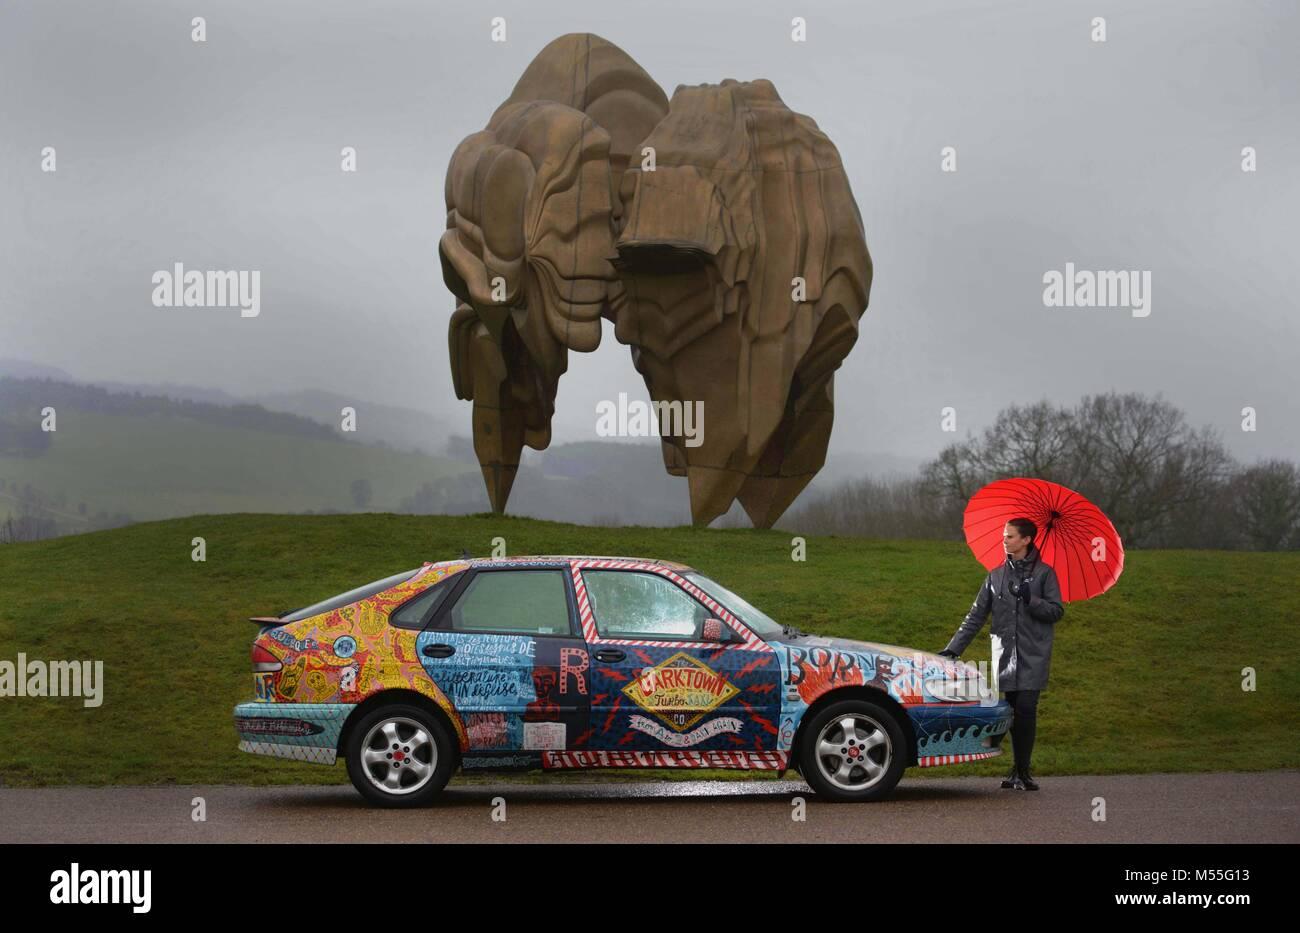 Yorkshire Sculpture Park, West Yorkshire, UK. 19th February, 2018. Kerry Chase of Yorkshire Sculpture Park with - Stock Image